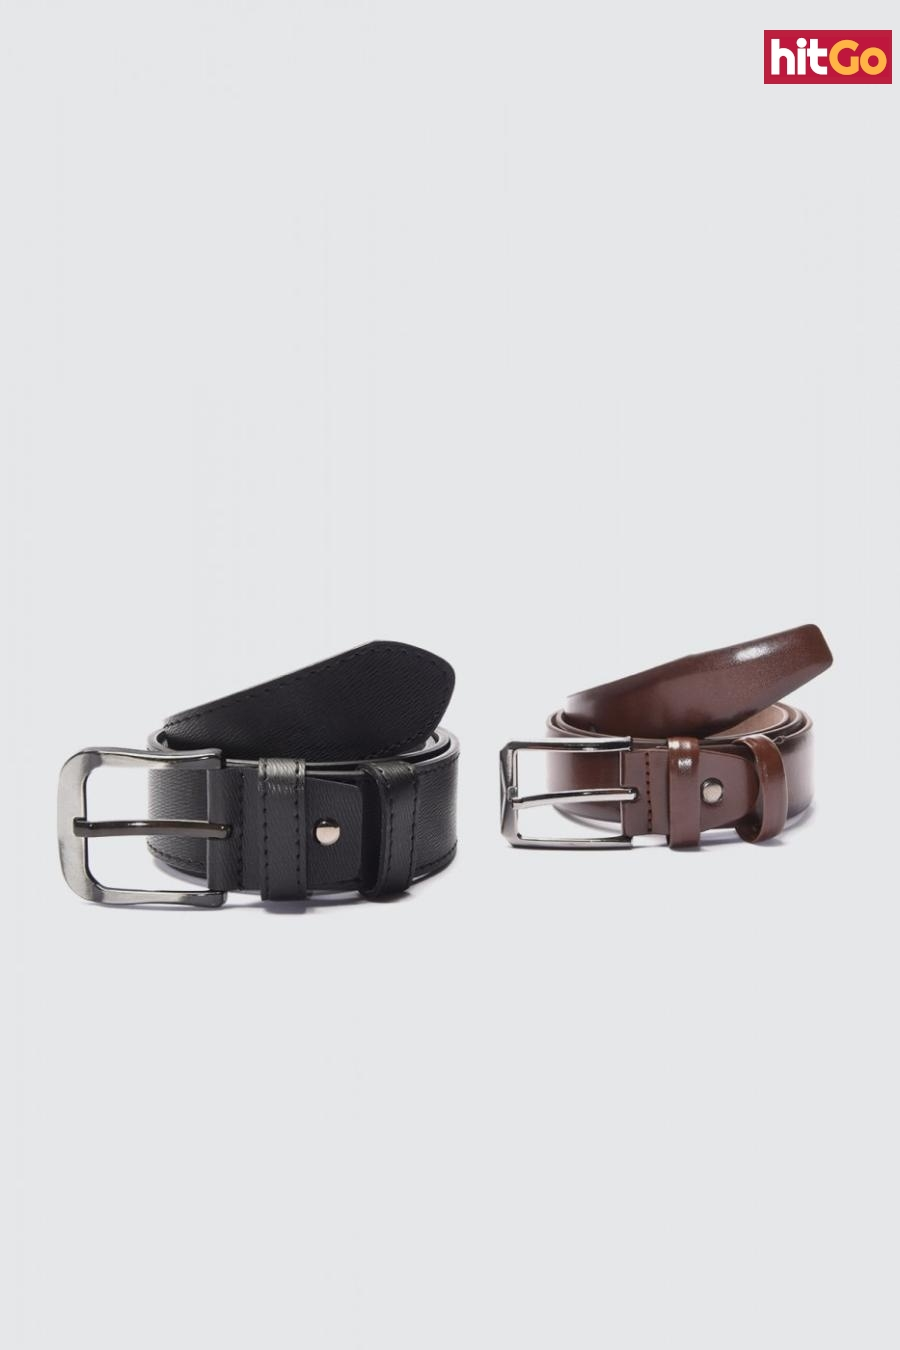 Trendyol Multicolored Mens 2-way FD Leather Belt pánské 120 CM